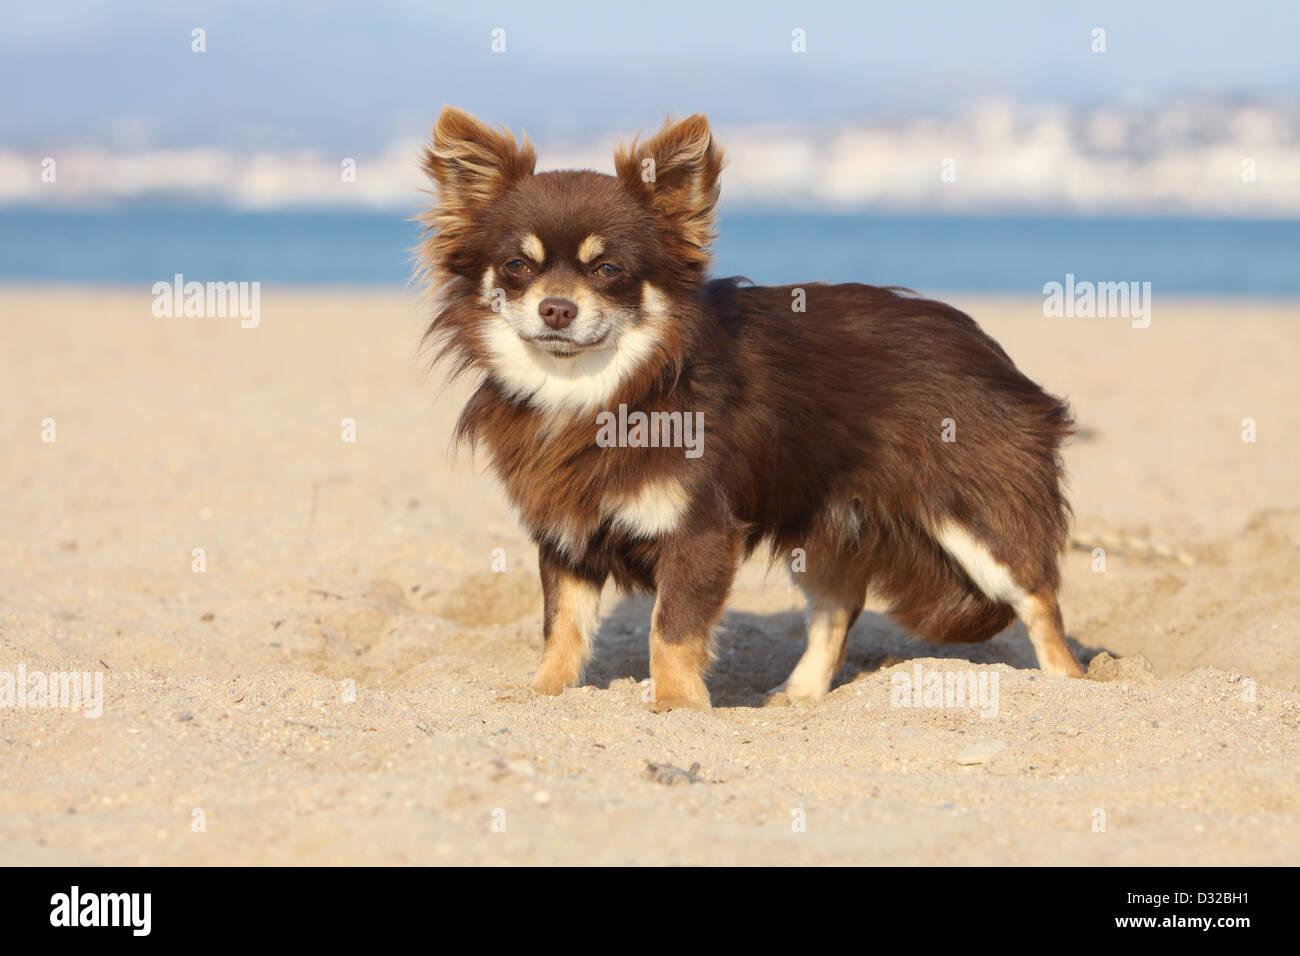 Hund Chihuahua Langhaar Erwachsene Stehen Am Strand Stockfotografie Alamy